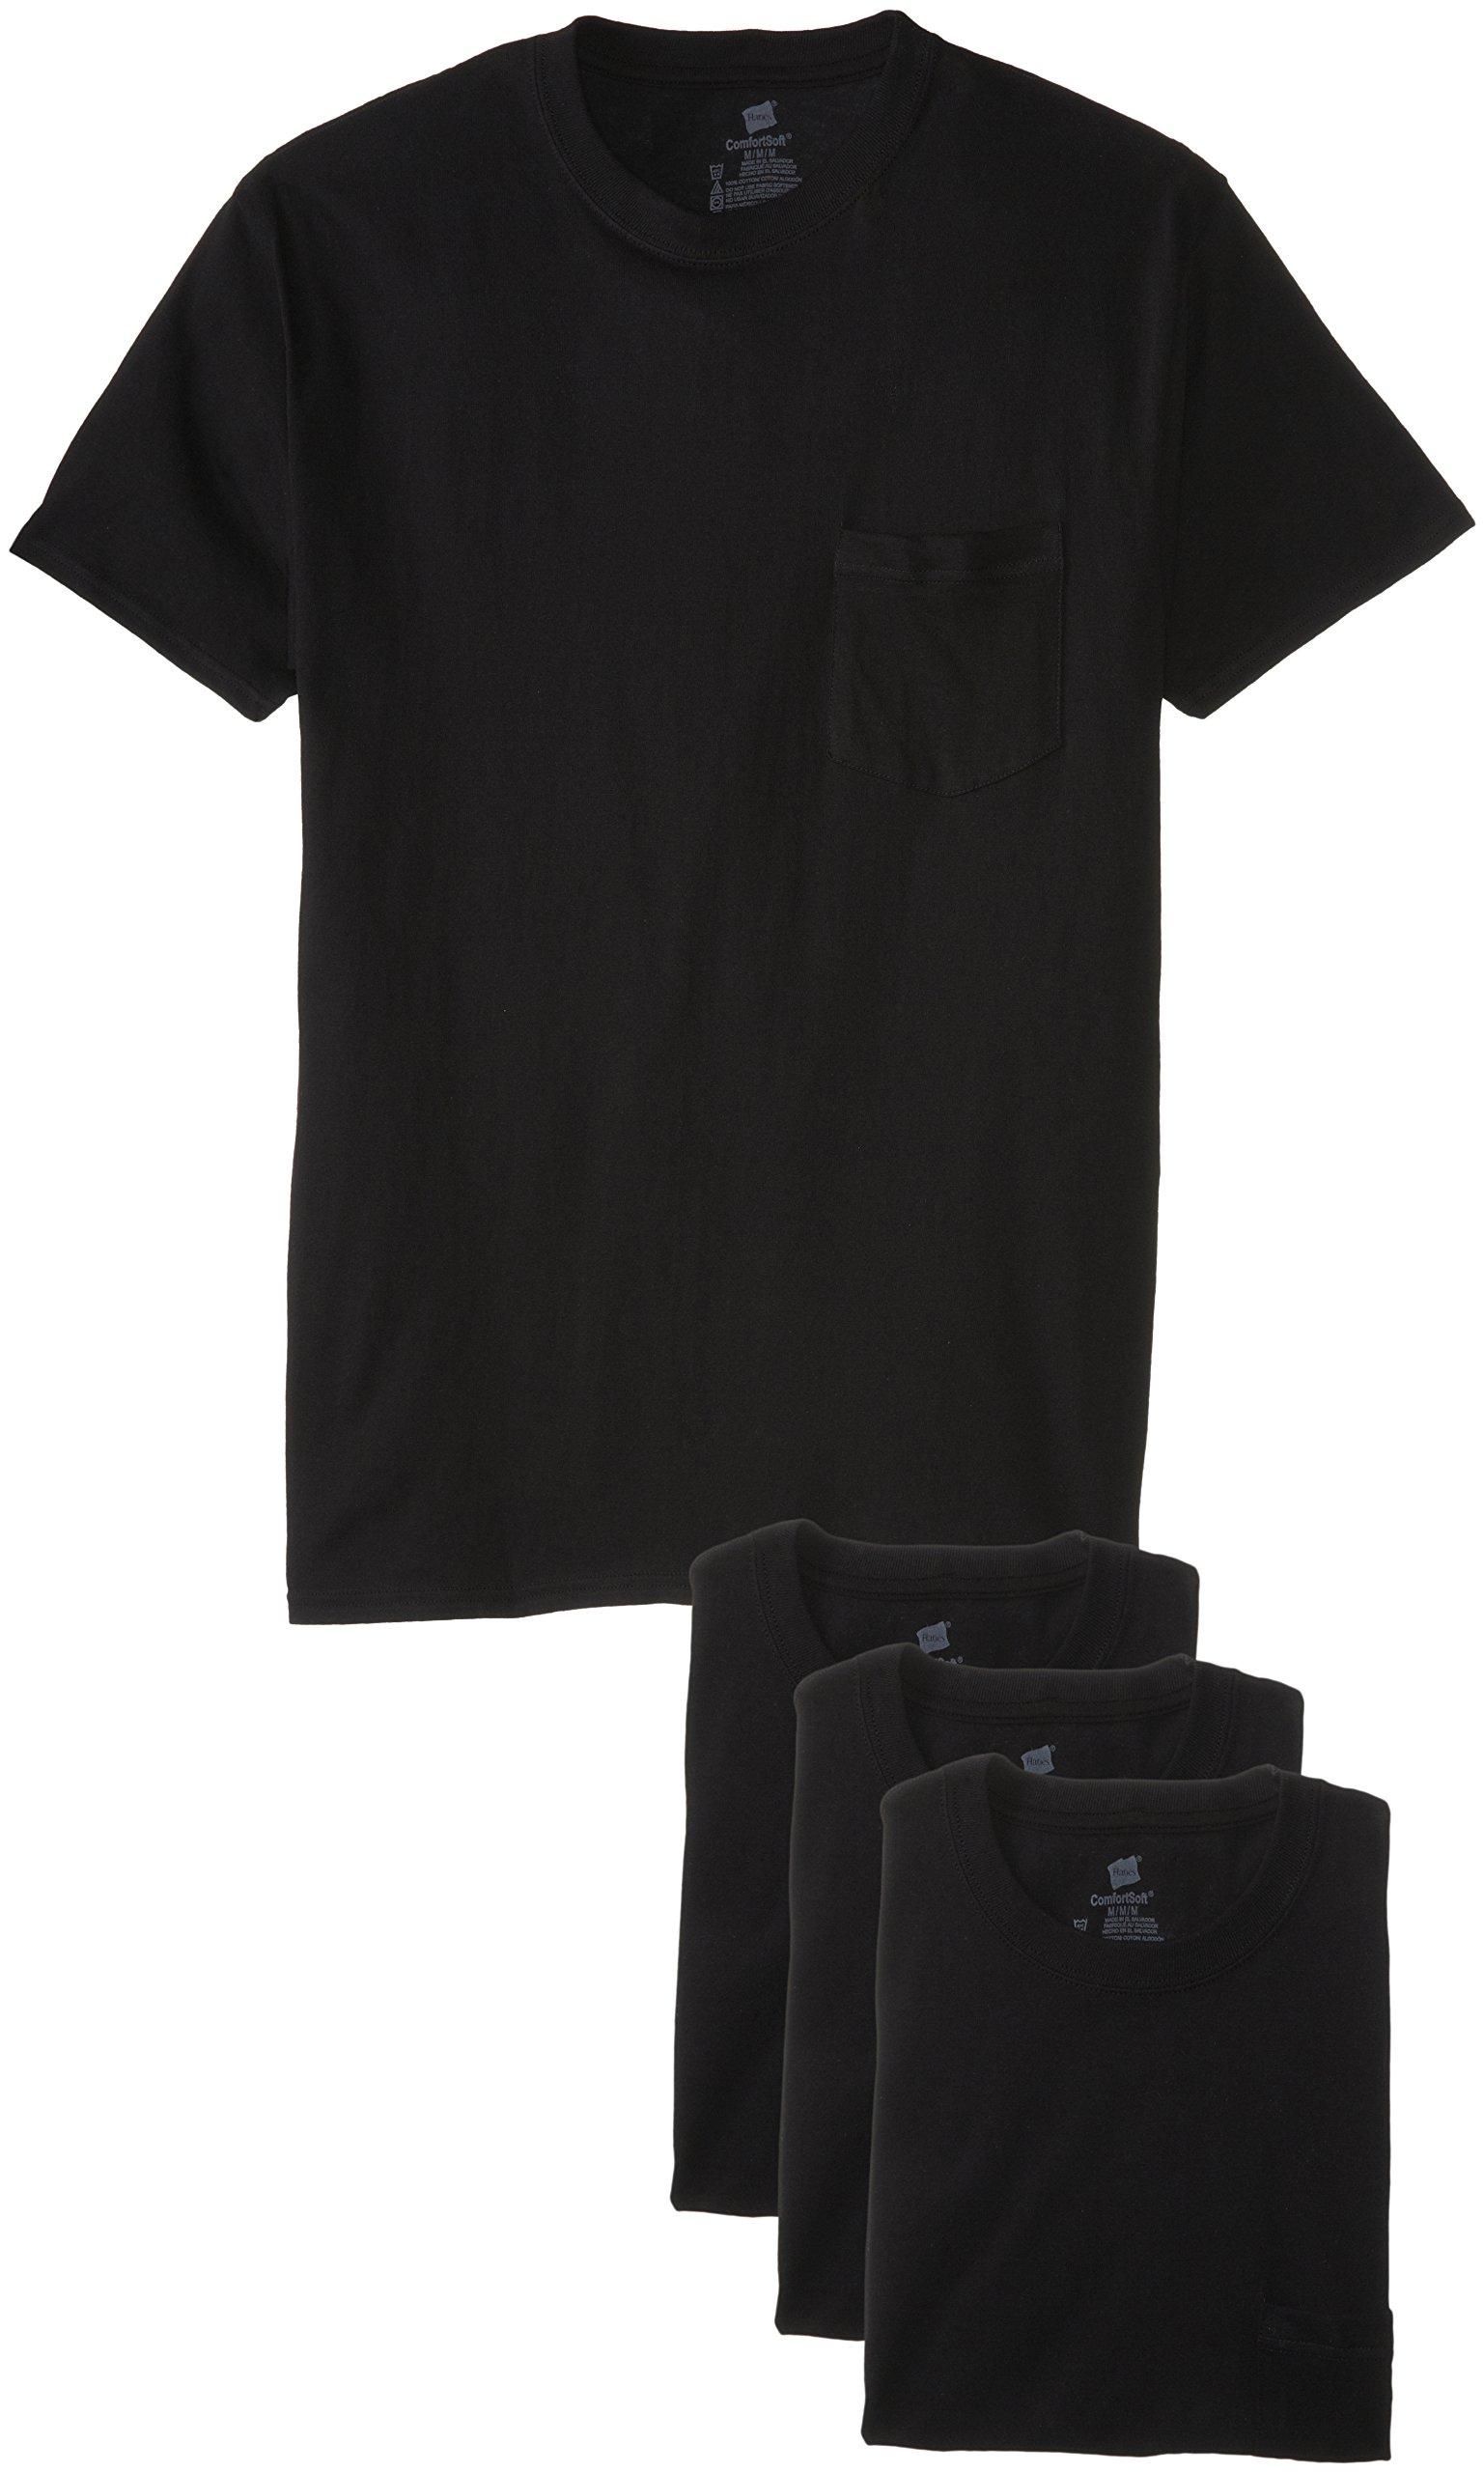 Hanes Men's 4-Pack FreshIQ Assorted Pocket T-Shirt, Black, X-Large